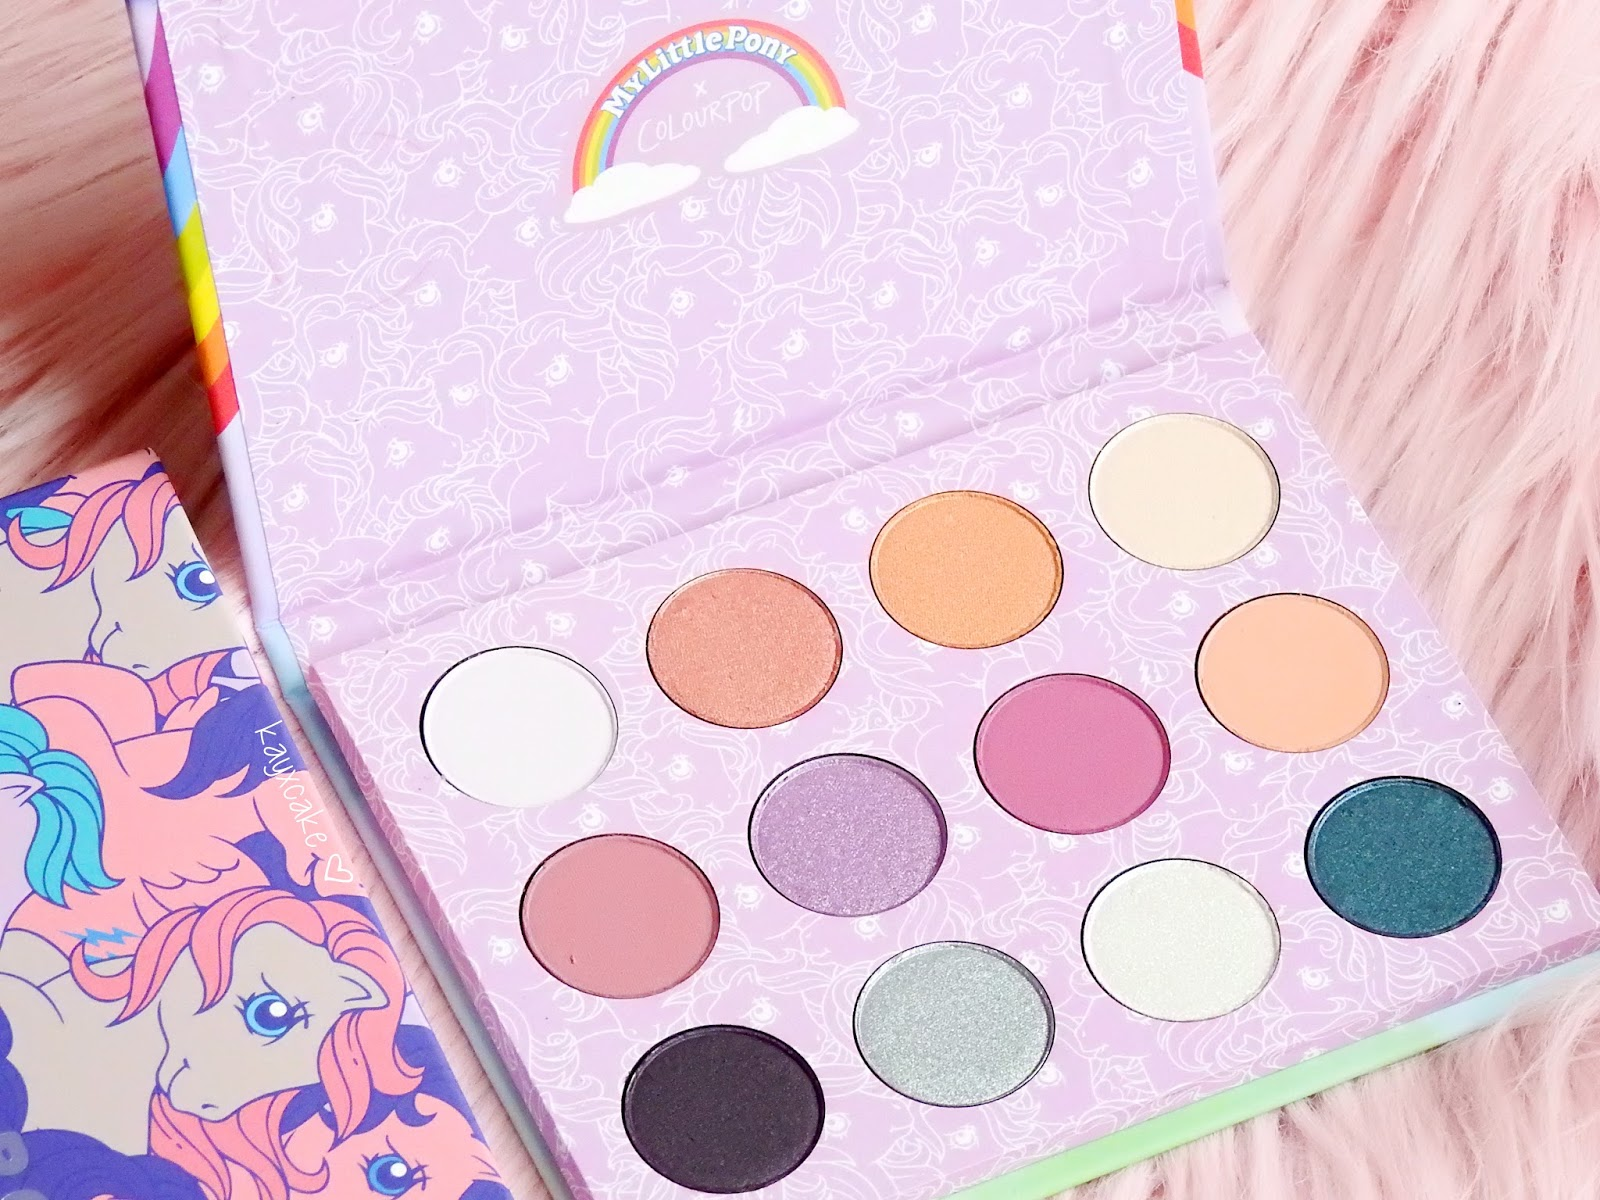 Kay Cake Beauty: ColourPop x My Little Pony Collection